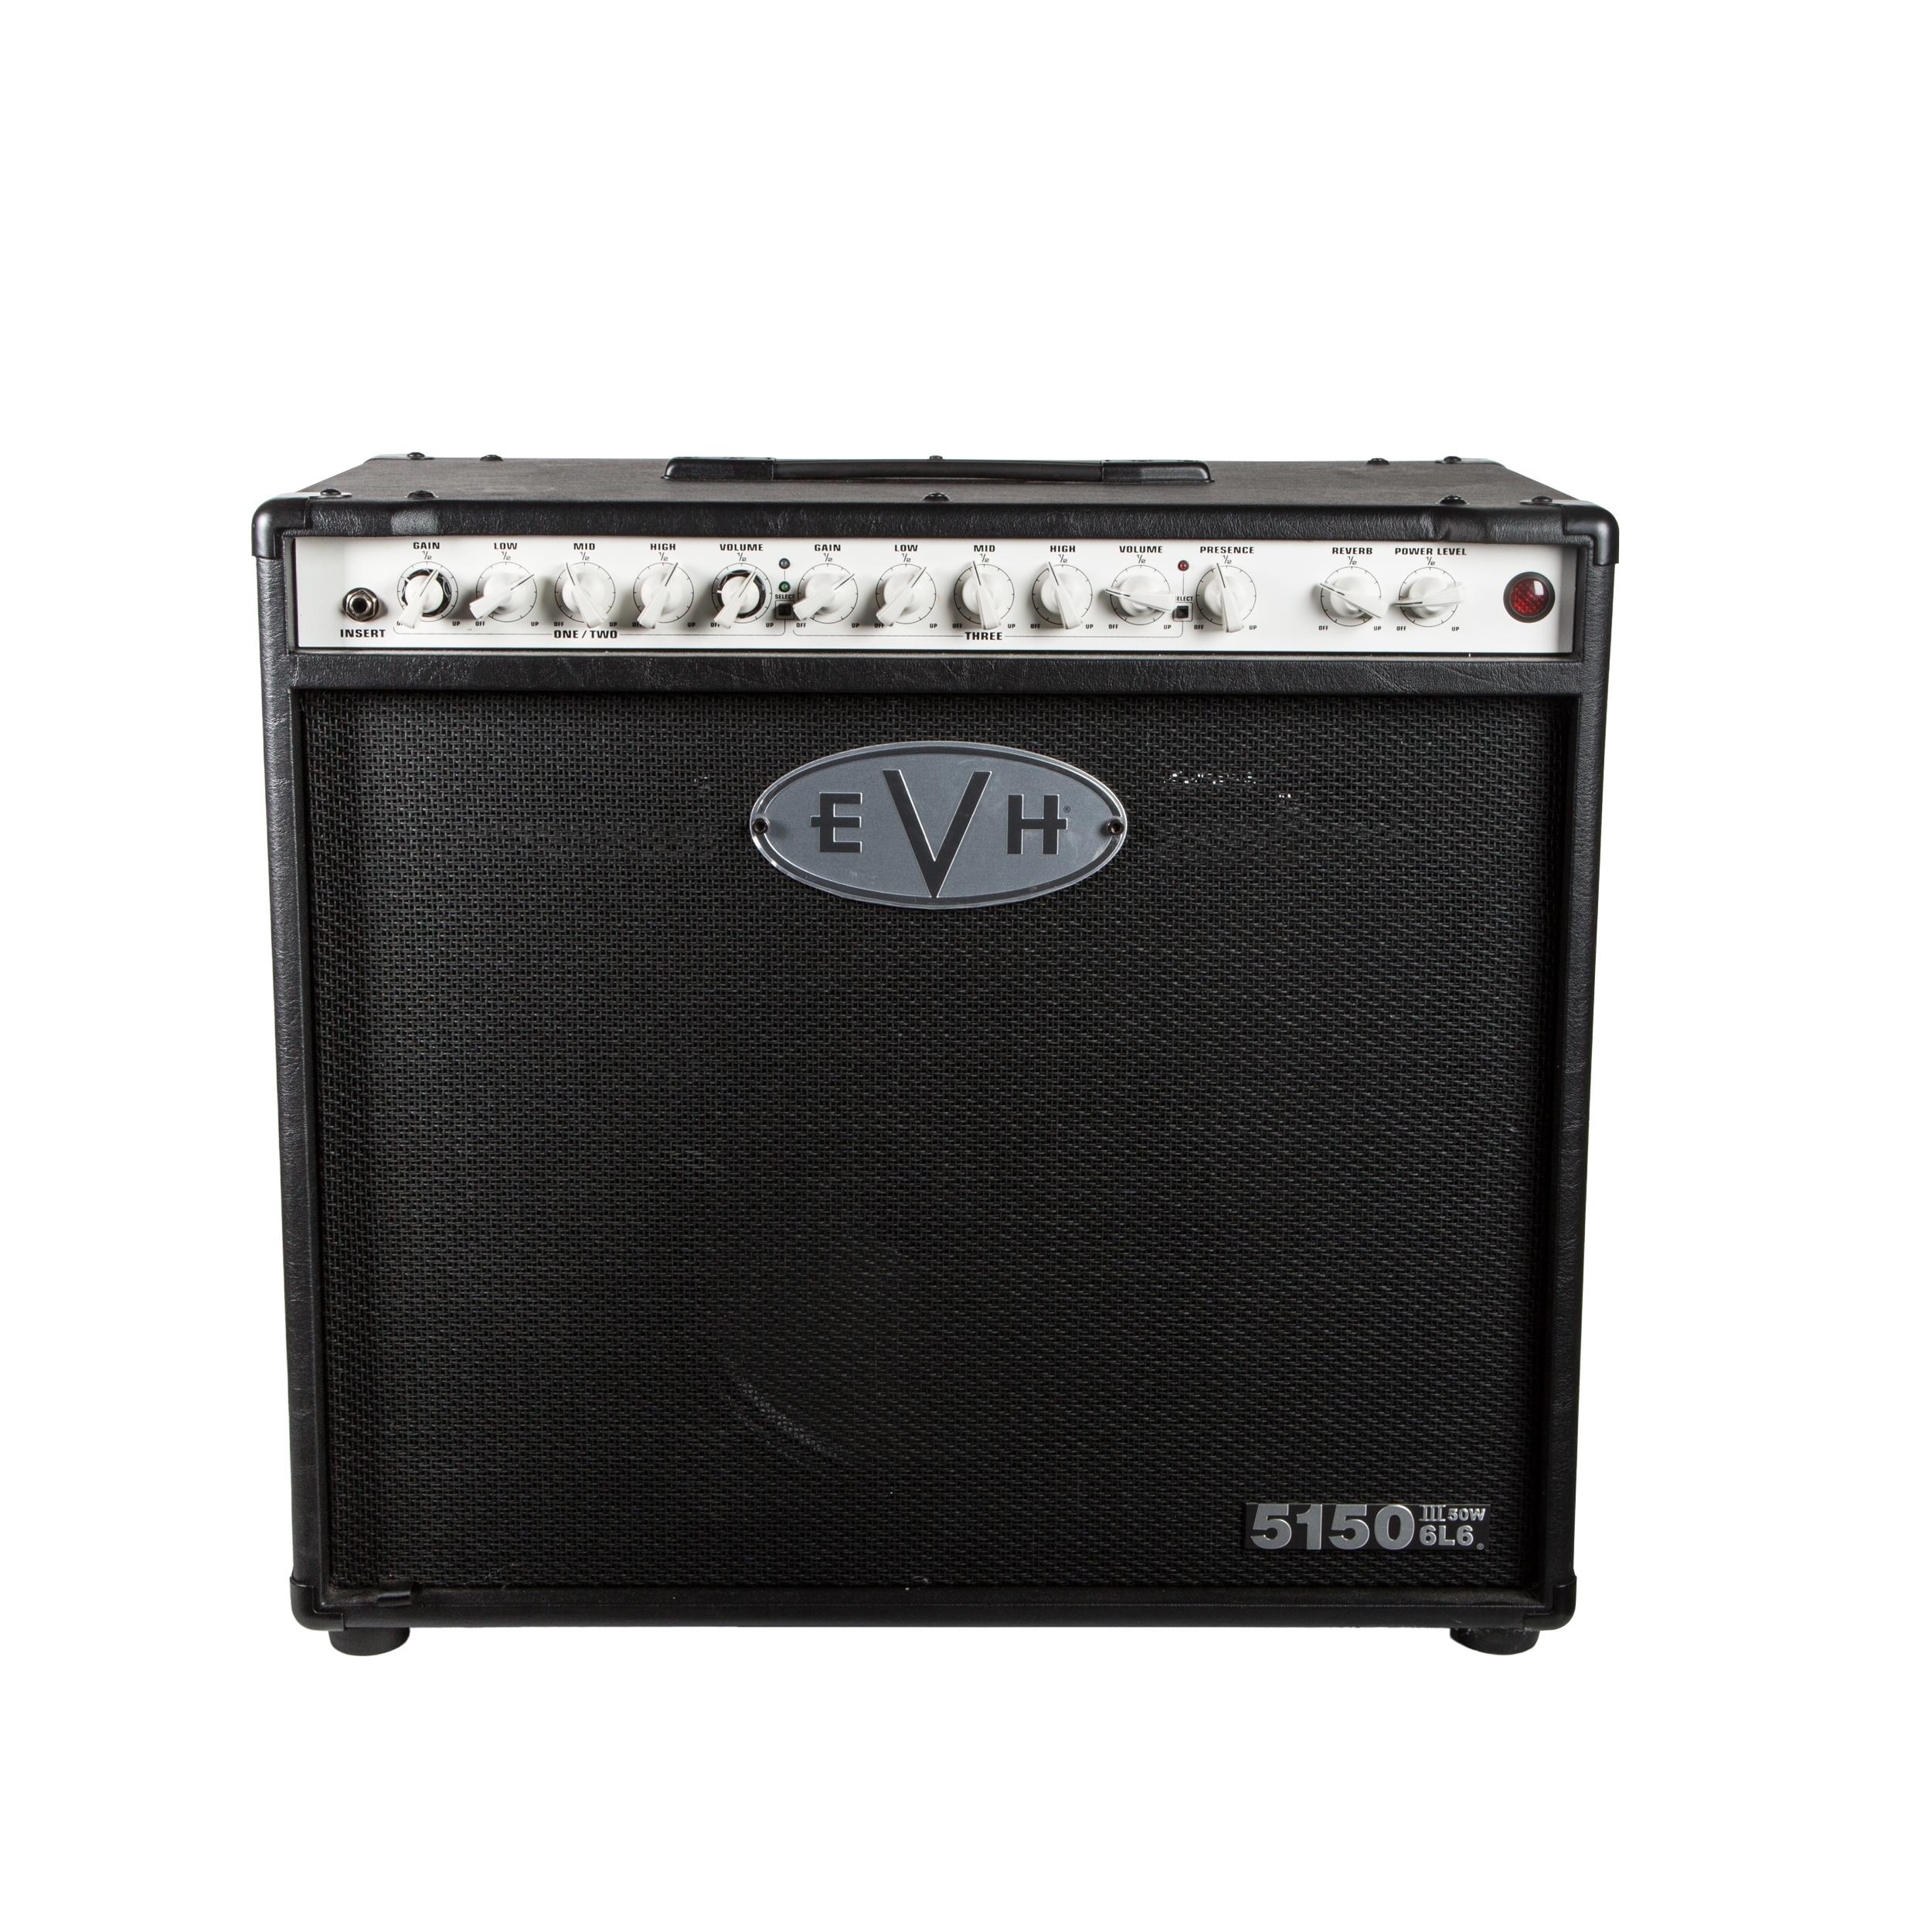 evh 5150 iii 50 watt 1x12 tube guitar combo amplifier in black ebay. Black Bedroom Furniture Sets. Home Design Ideas